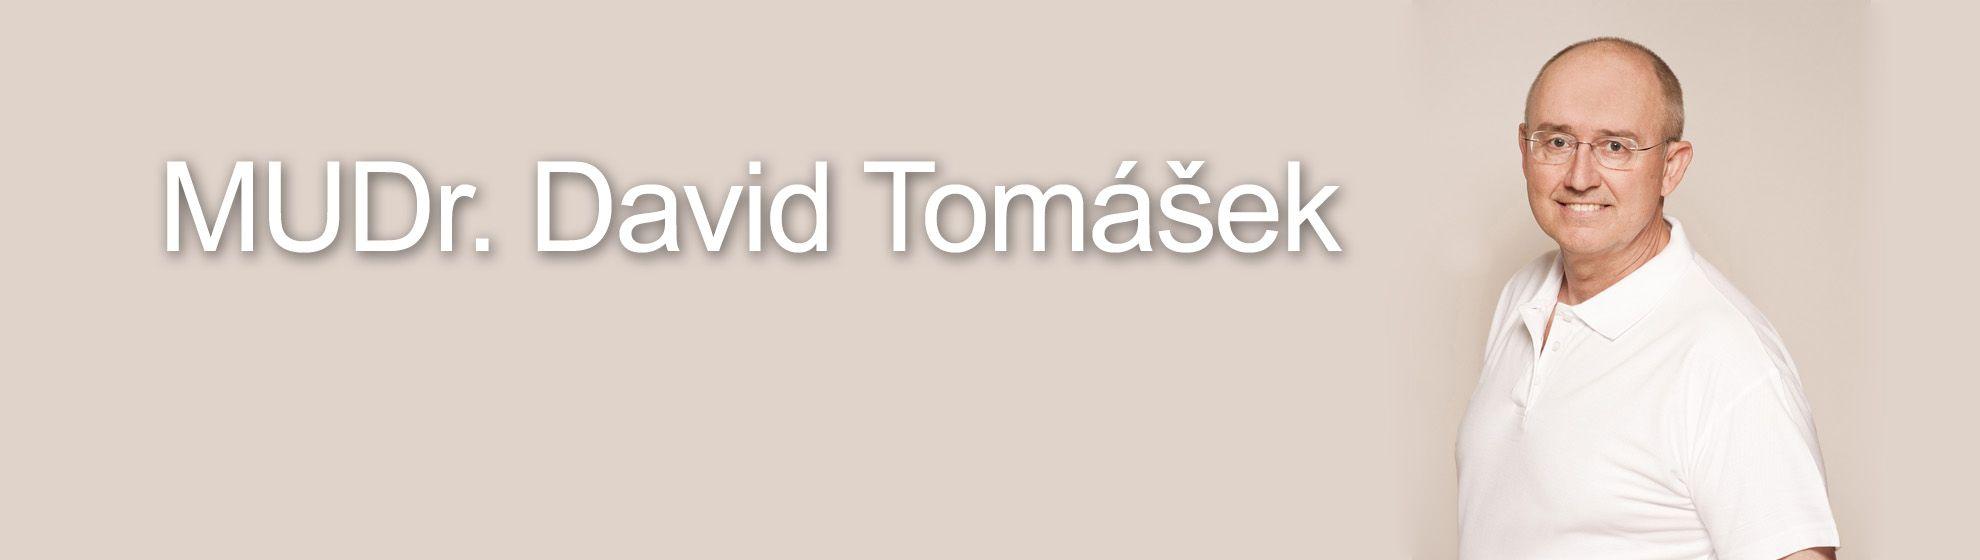 MUDr. David Tomášek